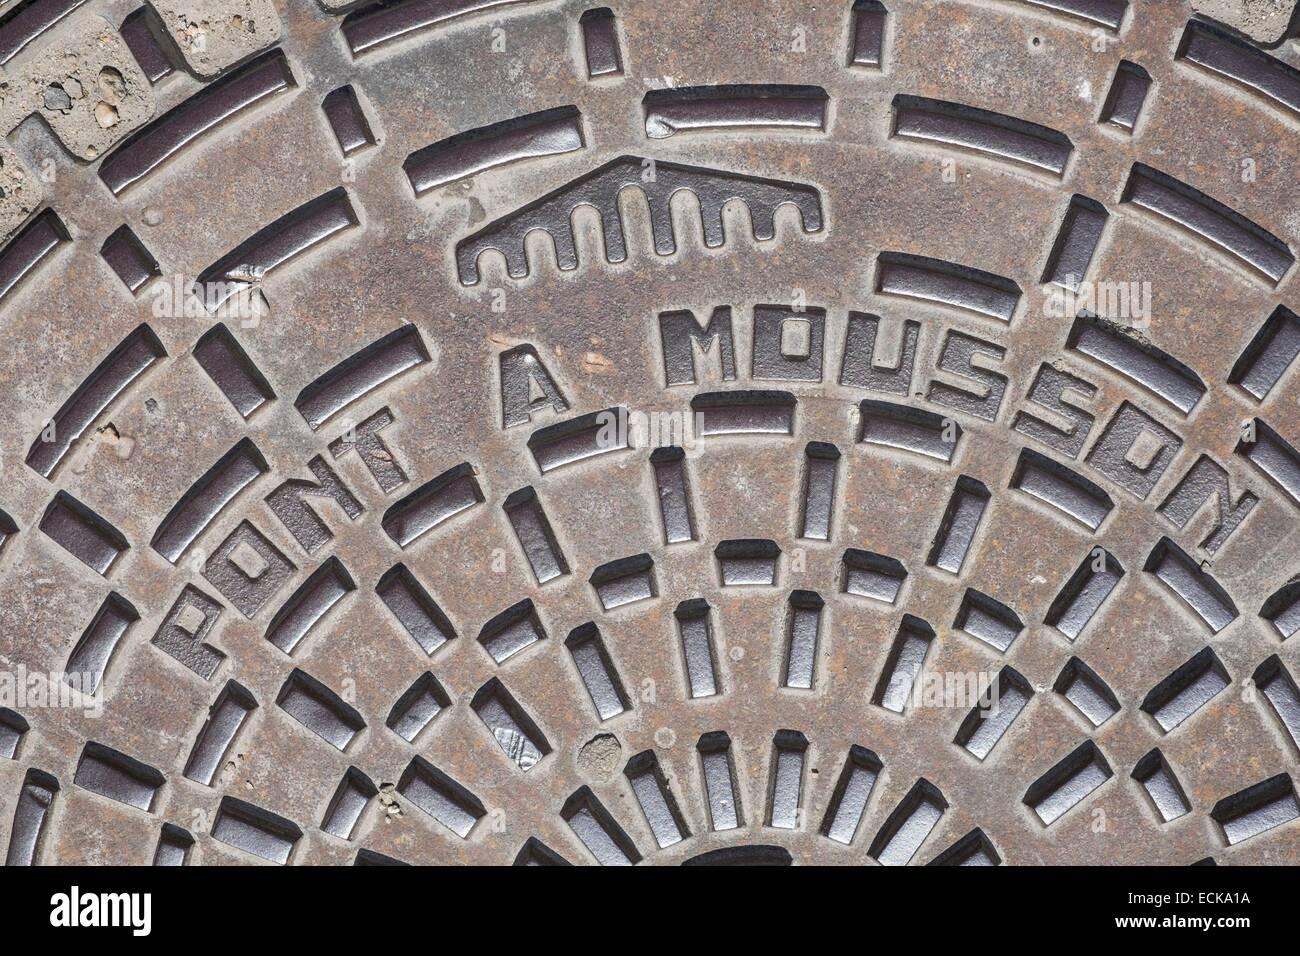 france meurthe et moselle pont a mousson cast iron manhole cover stock photo royalty free. Black Bedroom Furniture Sets. Home Design Ideas